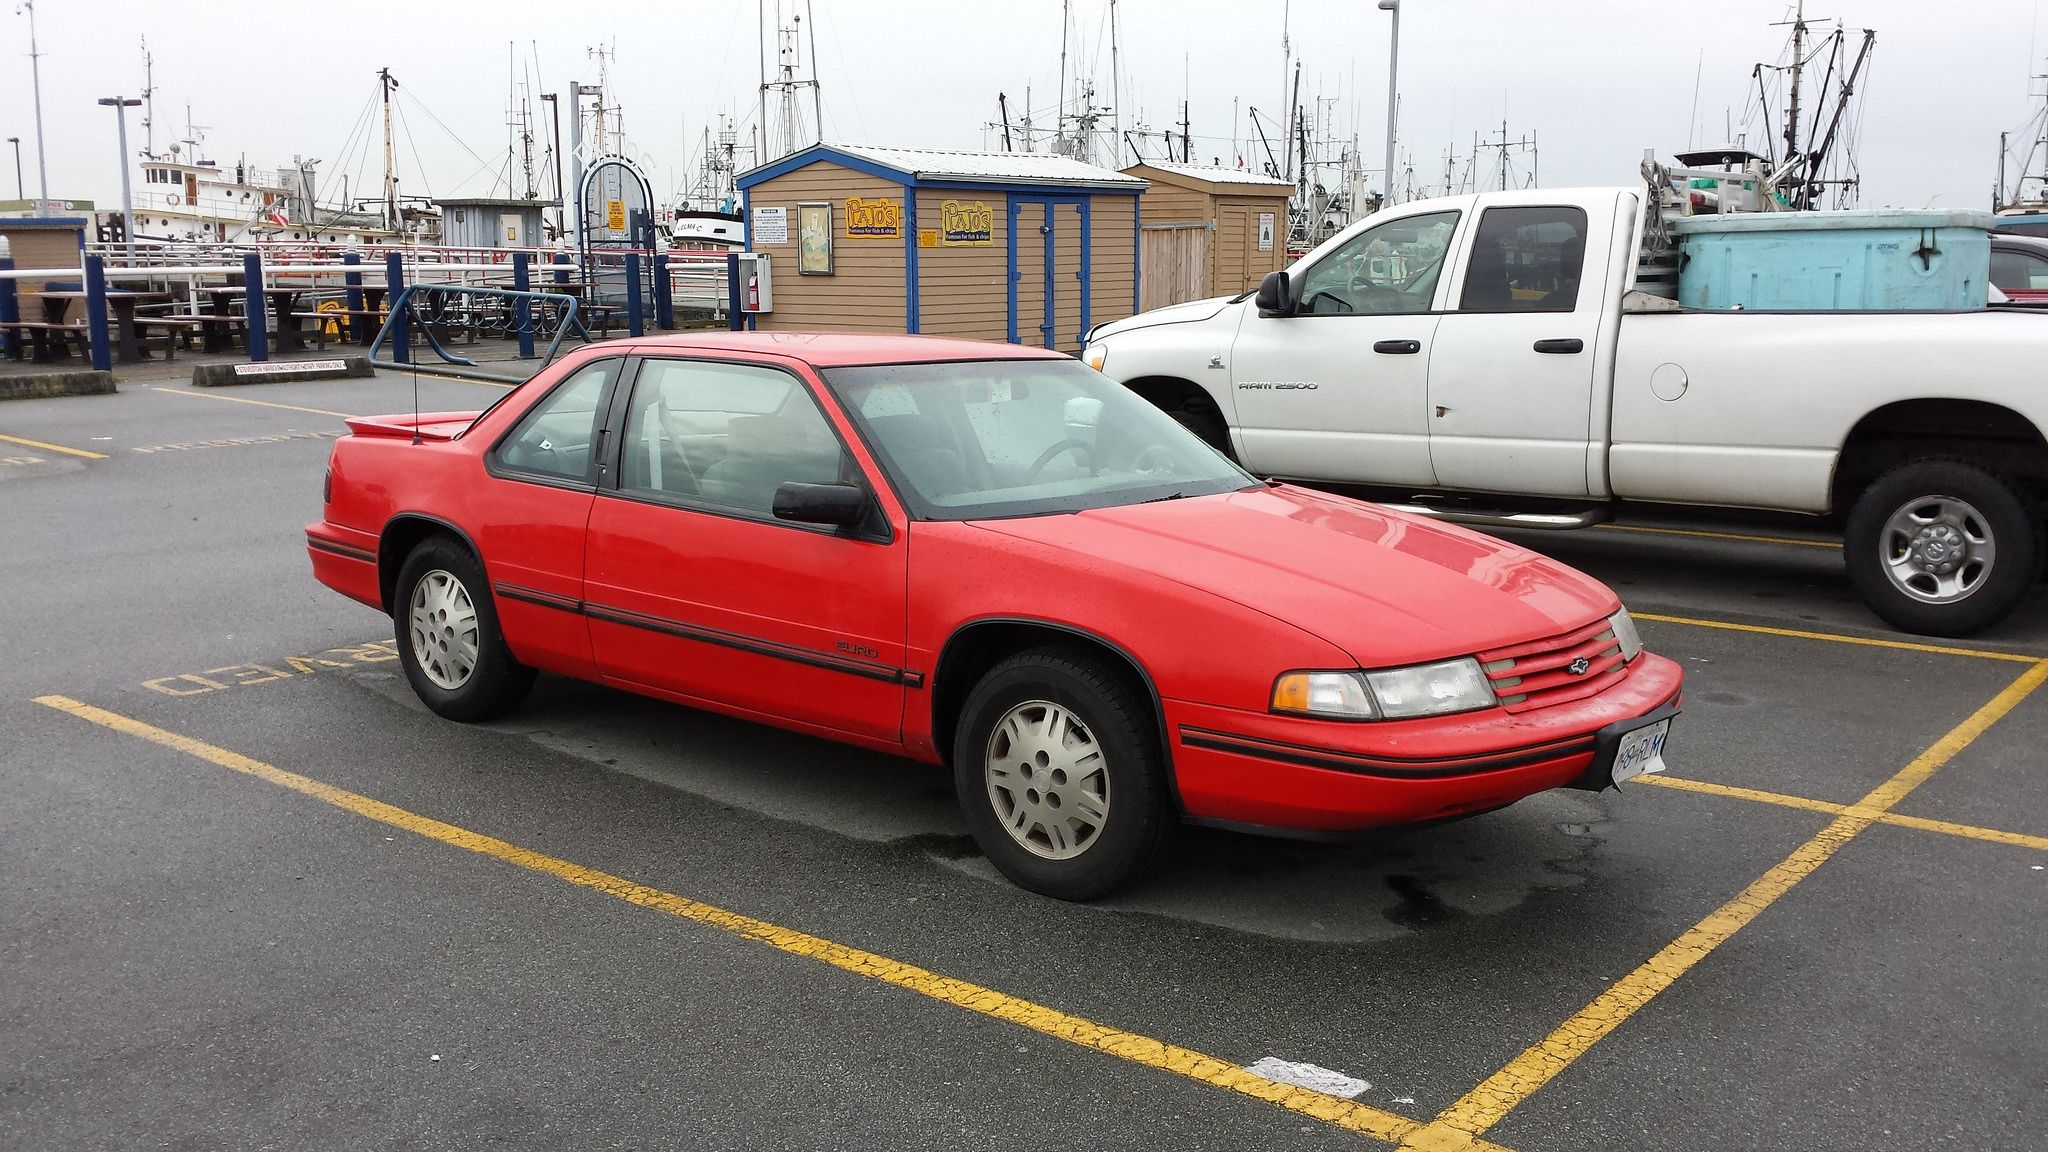 1991-94 Chevy Lumina Euro Coupe Chevrolet Lumina, Chevy, Euro